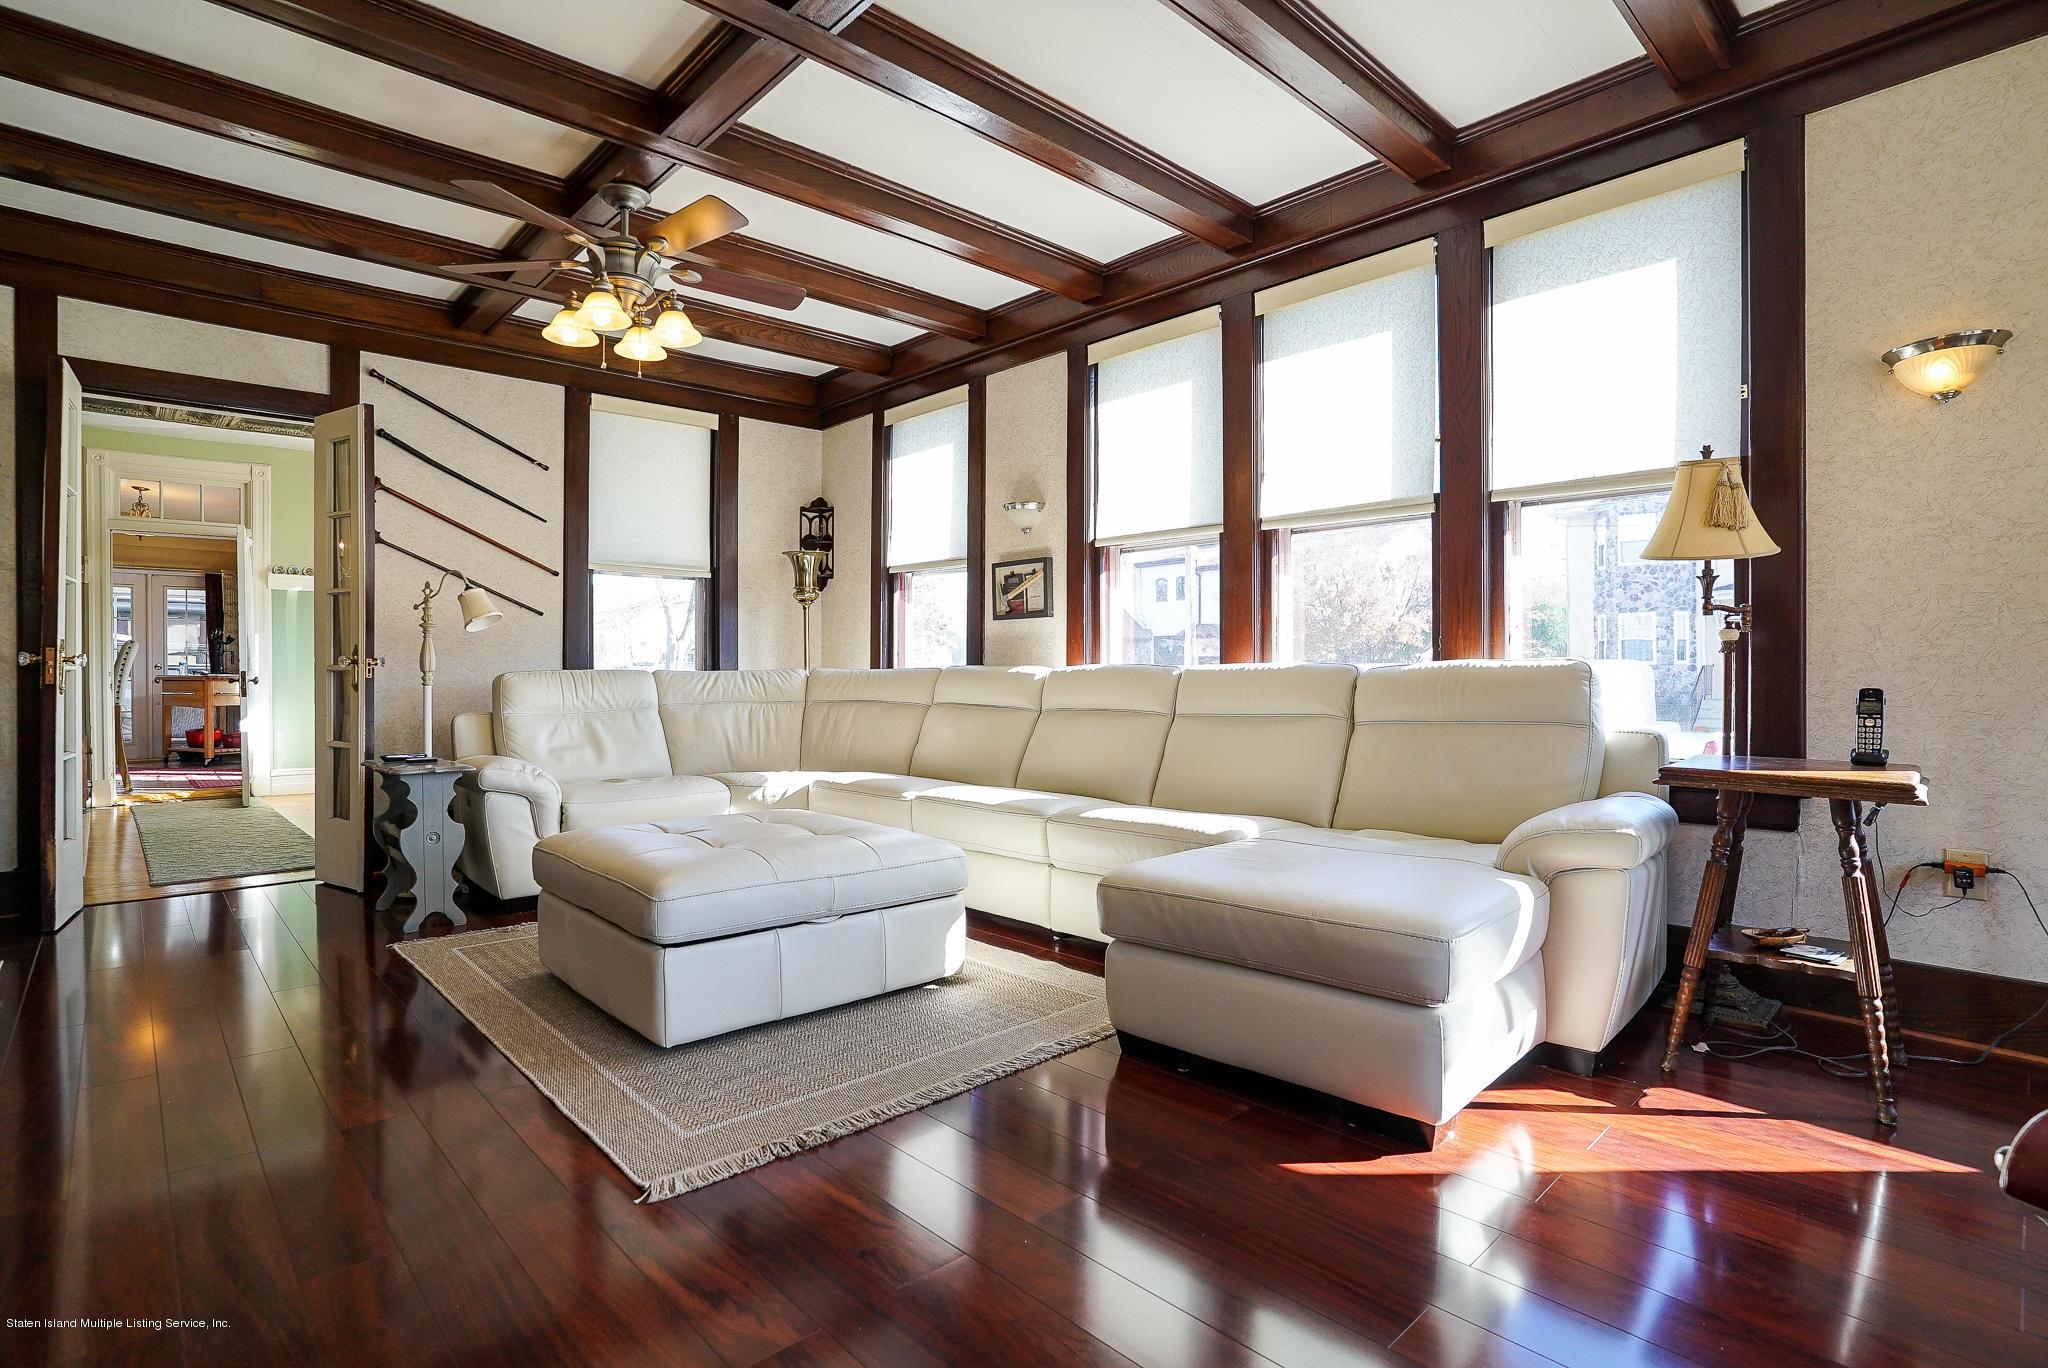 Single Family - Detached 309 Guyon Avenue  Staten Island, NY 10306, MLS-1142302-16